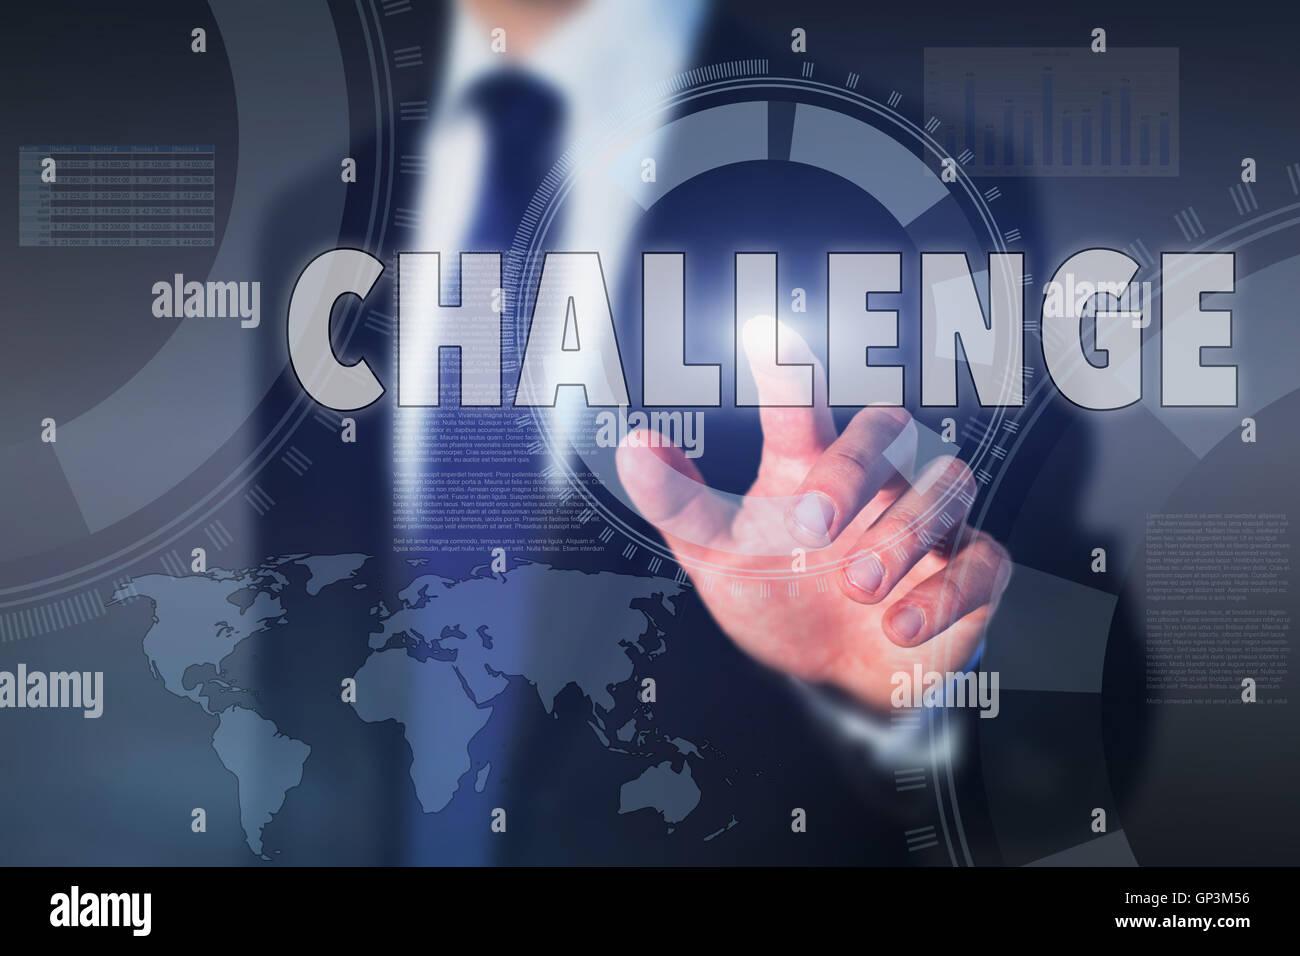 Herausforderung Konzept, Business-Mann berühren Wort auf touchscreen Stockbild